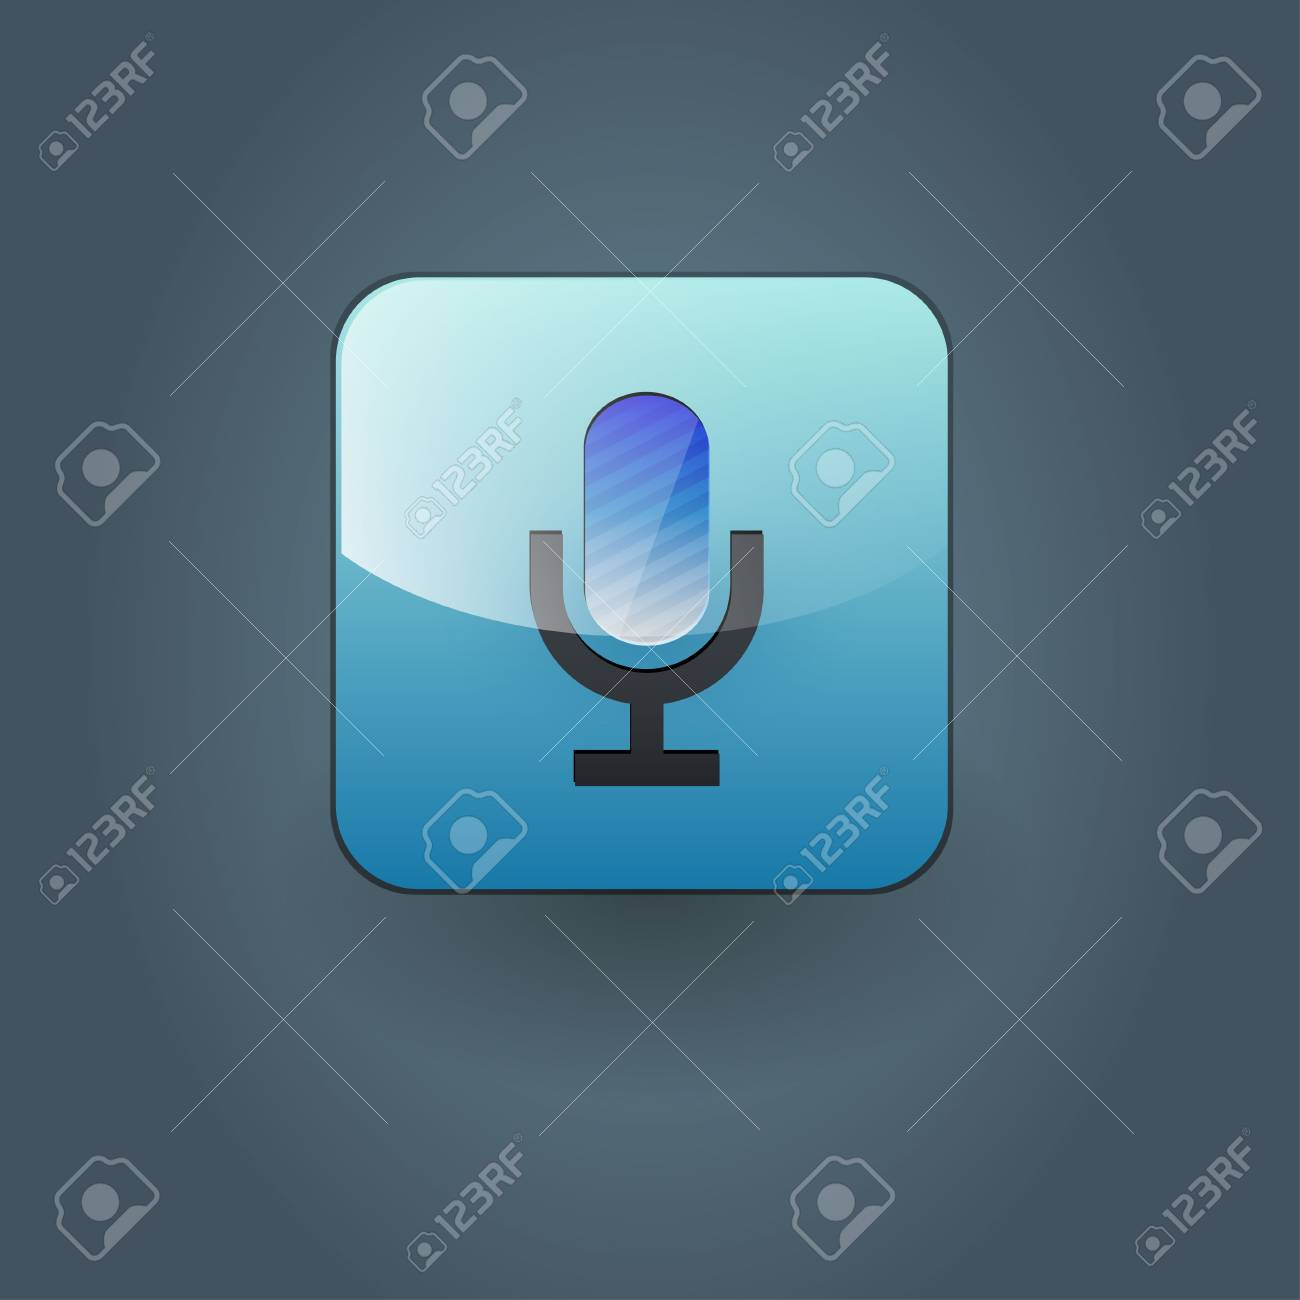 Microphone icon Stock Vector - 21310985